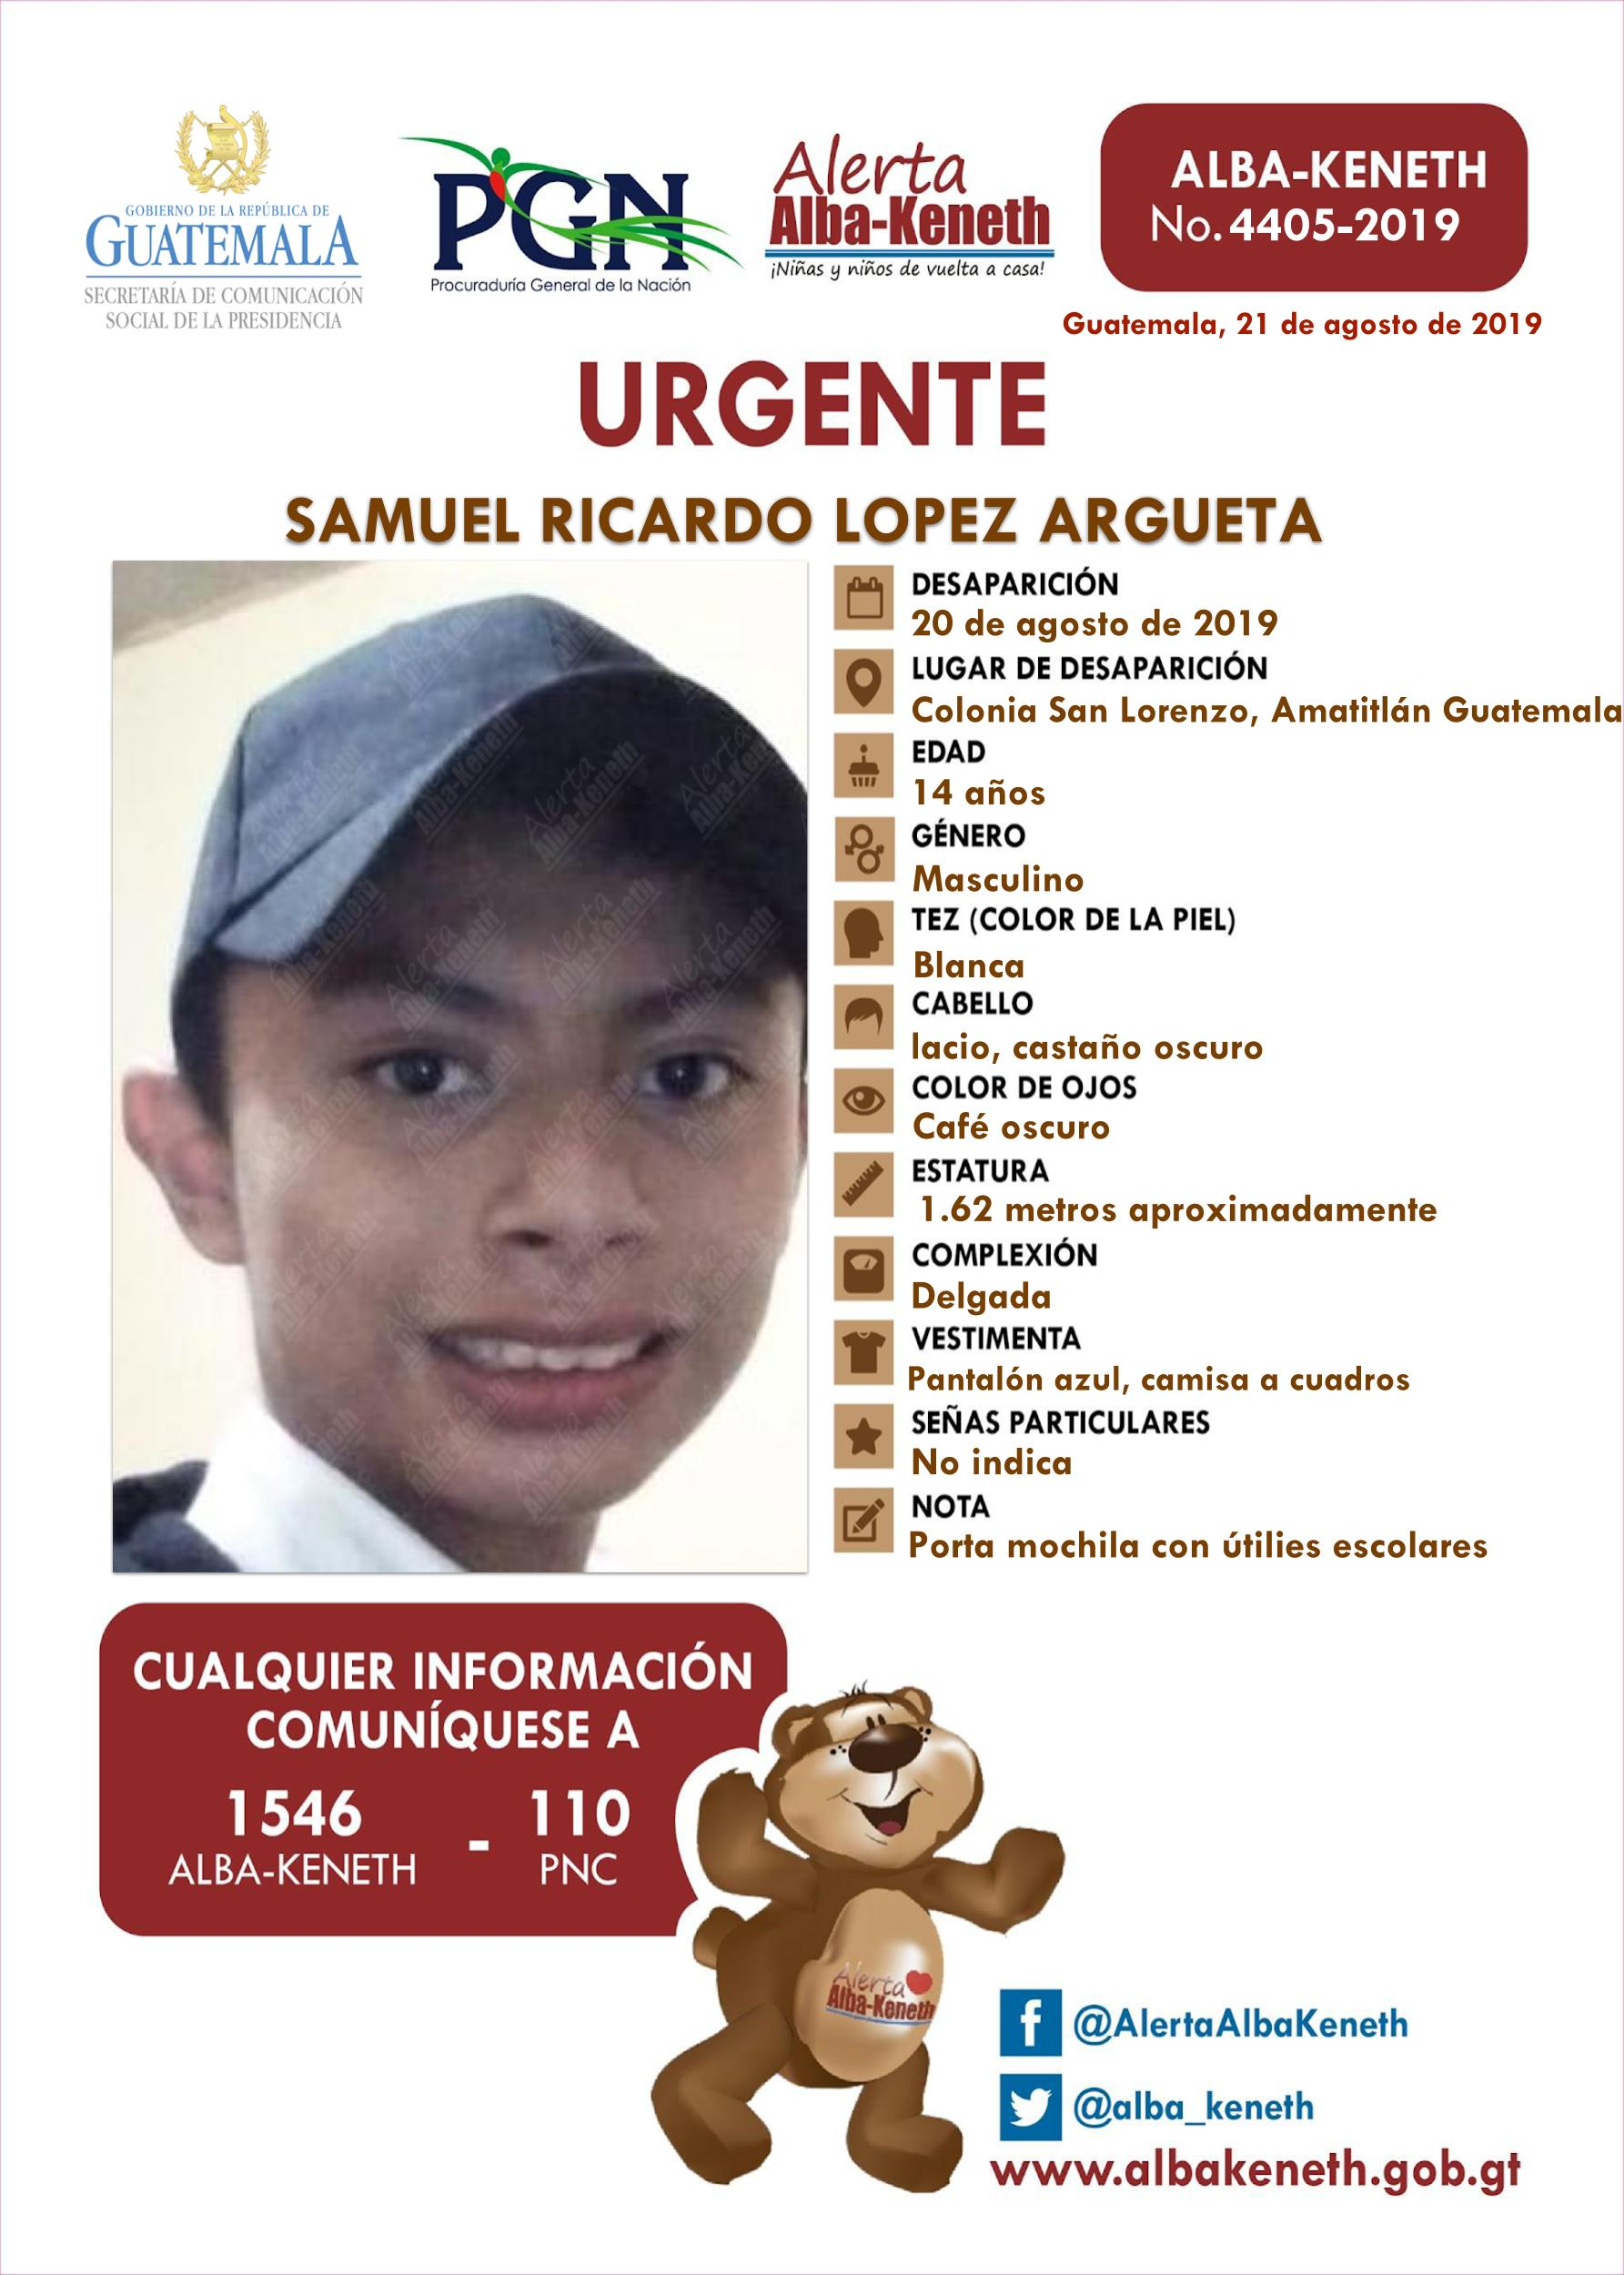 Samuel Ricardo Lopez Argueta